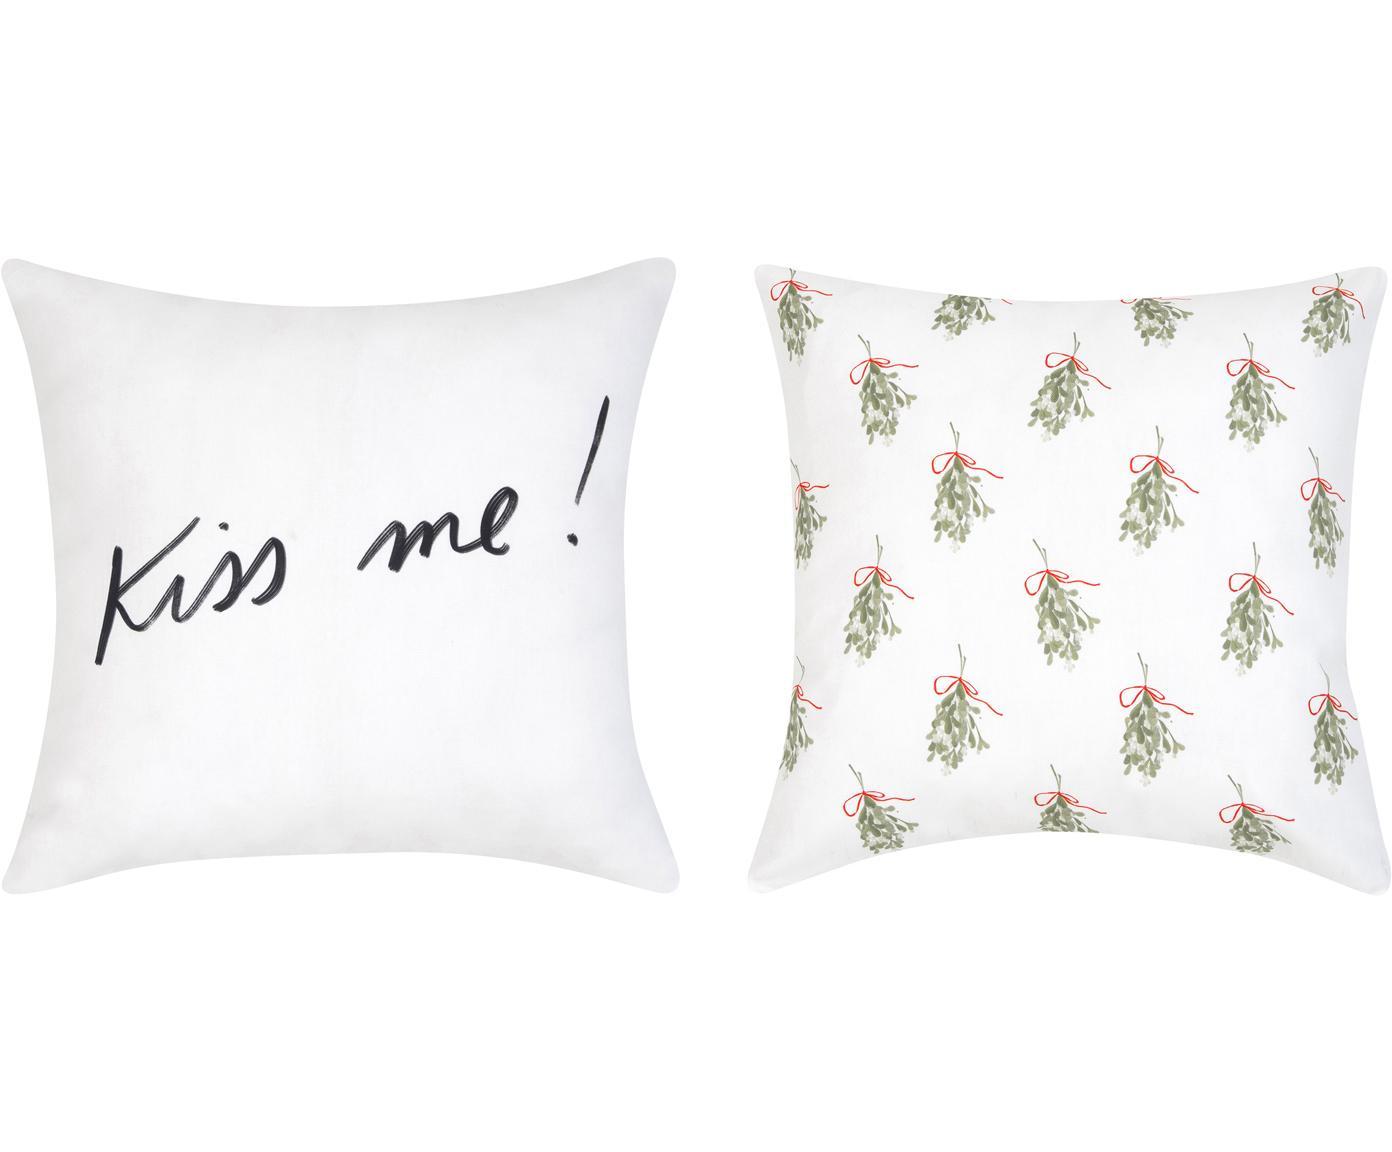 Designer Kissenhüllen Mistletoe von Kera Till, 2er-Set, Baumwolle, Grün, Rot, Schwarz, Weiss, 40 x 40 cm